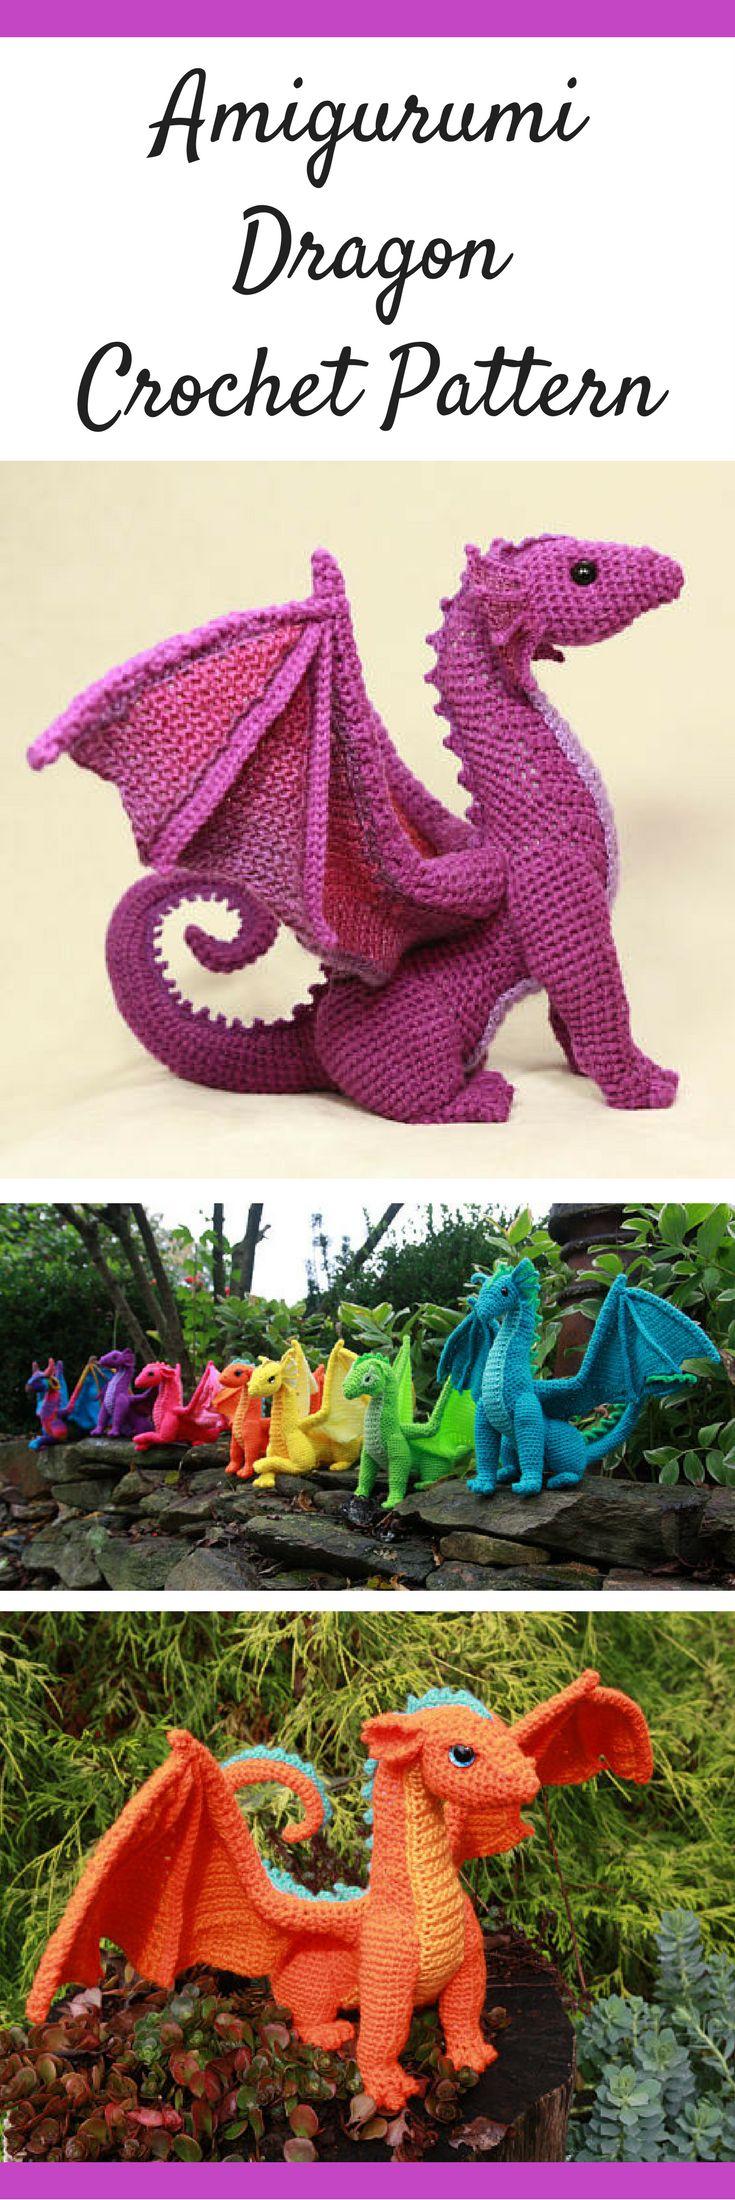 Dragon Amigurumi Crochet Pattern printable $5.00